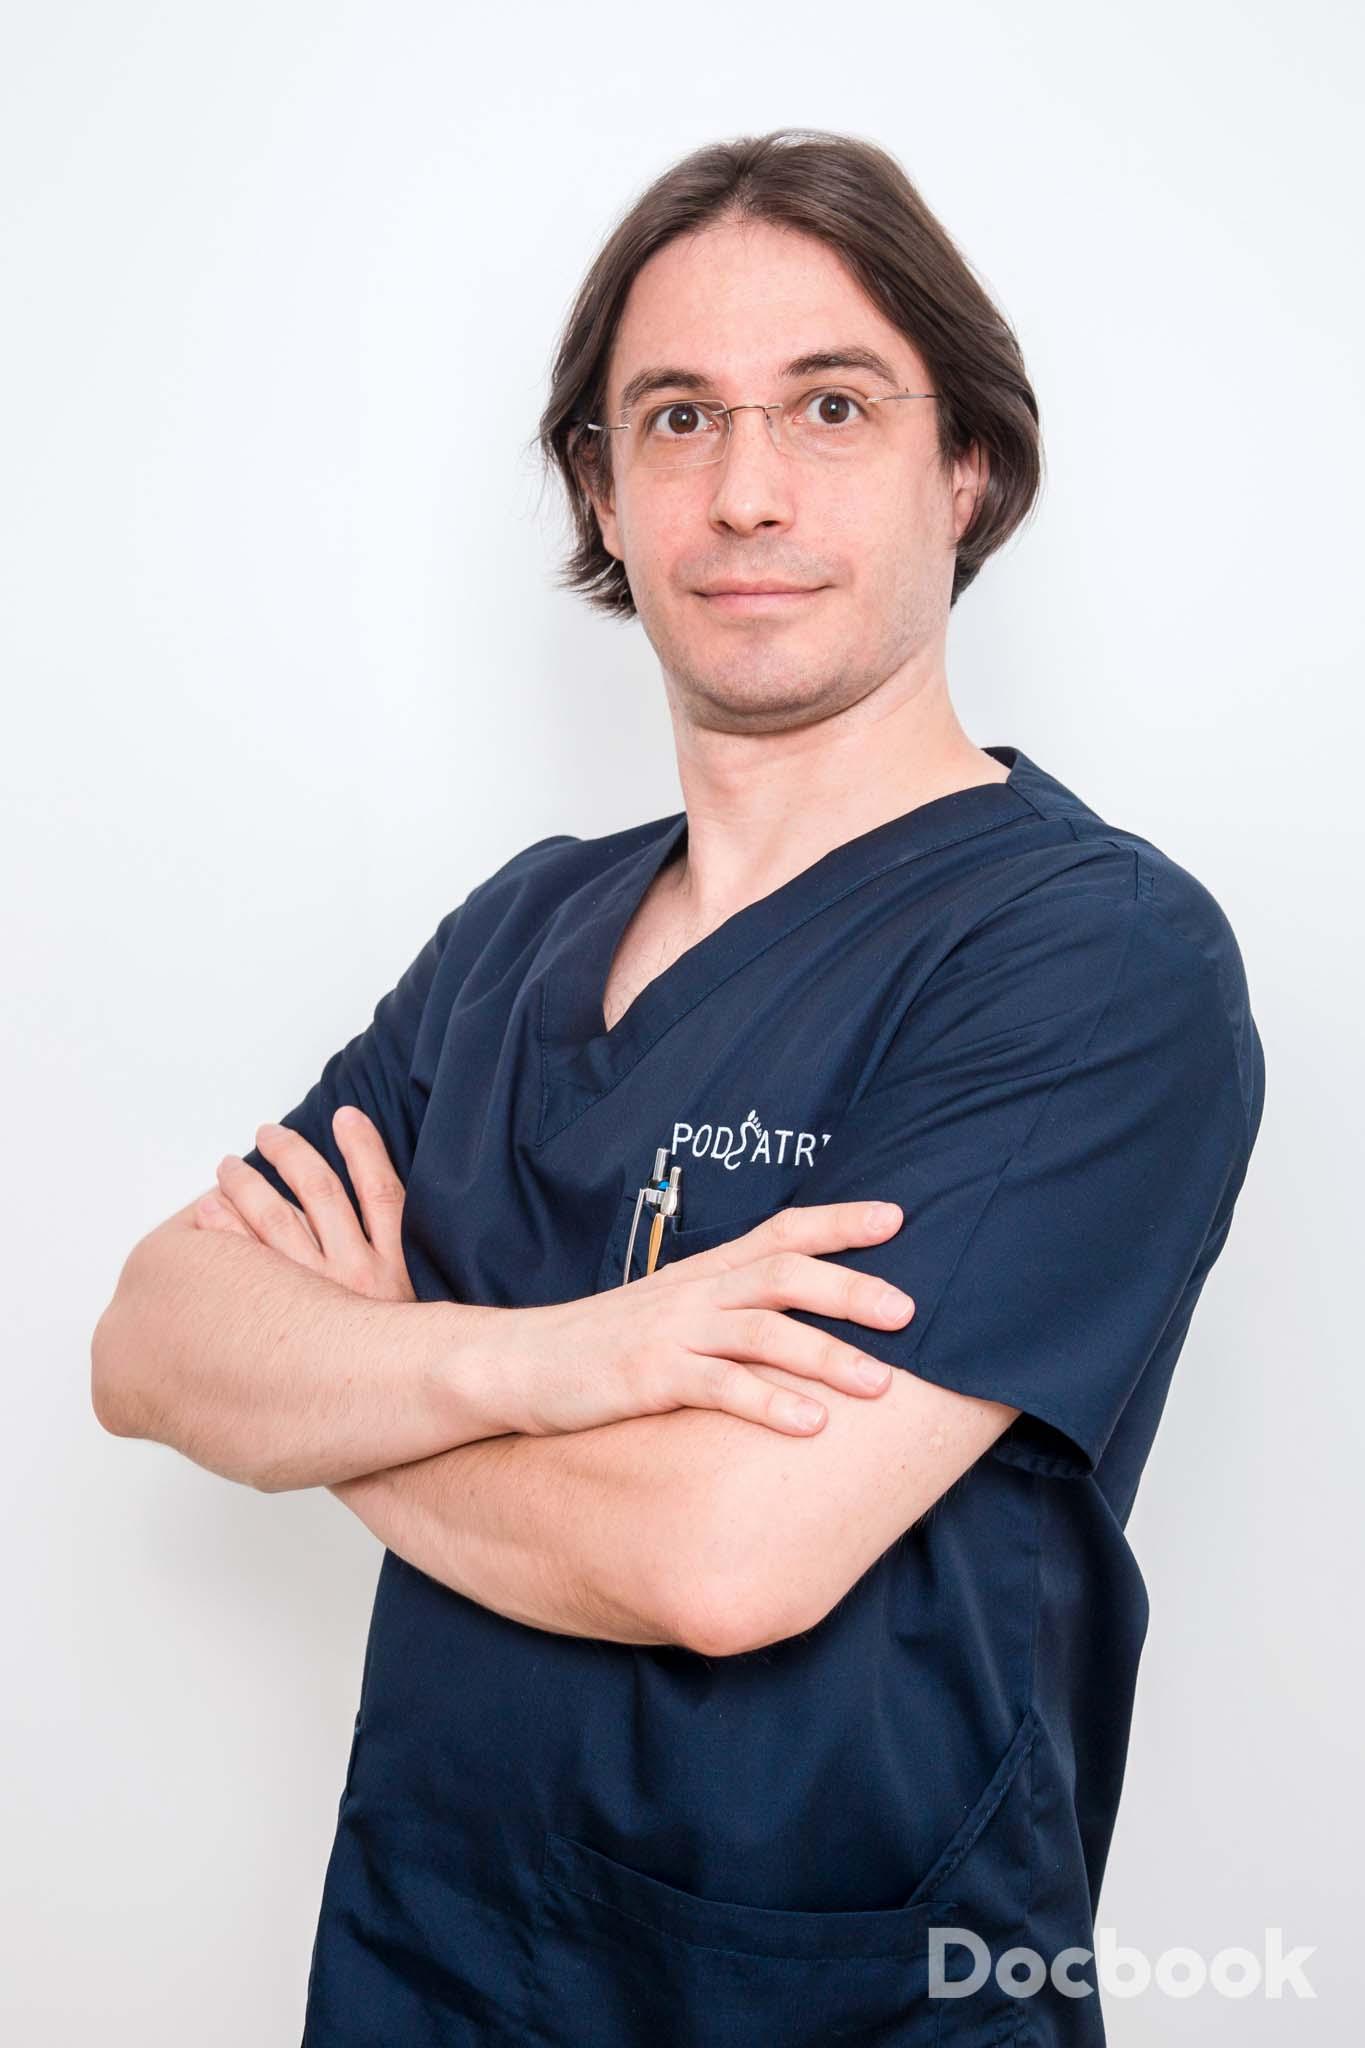 Dr. Tudor Marinescu